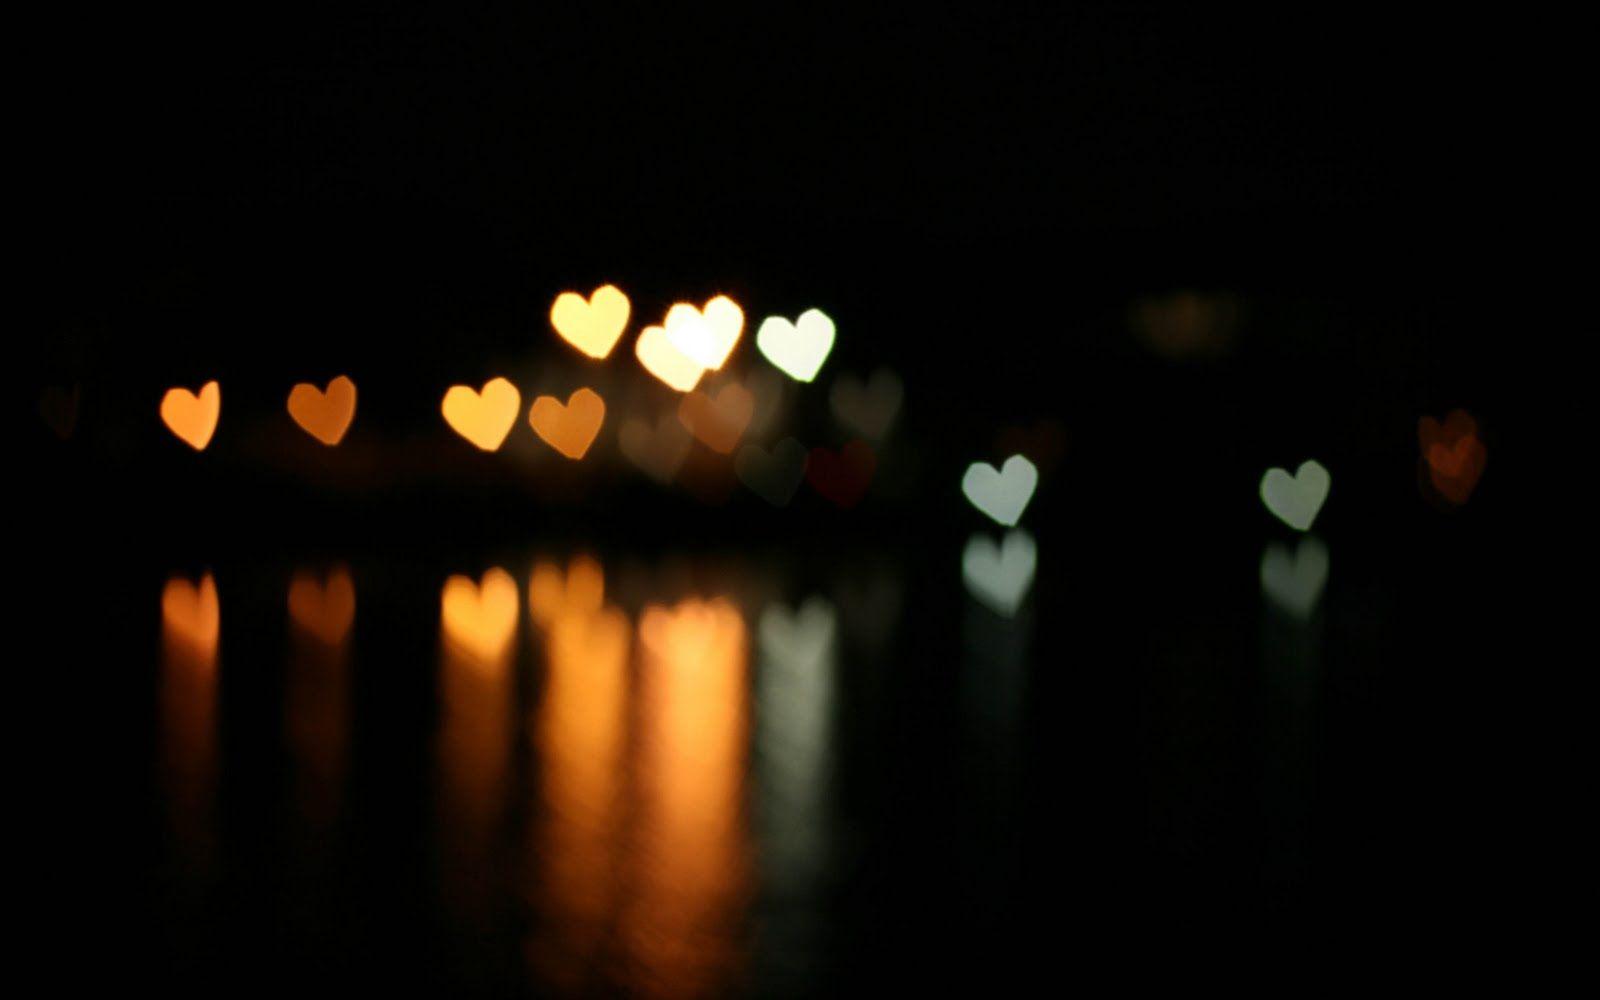 Dark Love Wallpaper For Backgrounds Bokeh Iphone